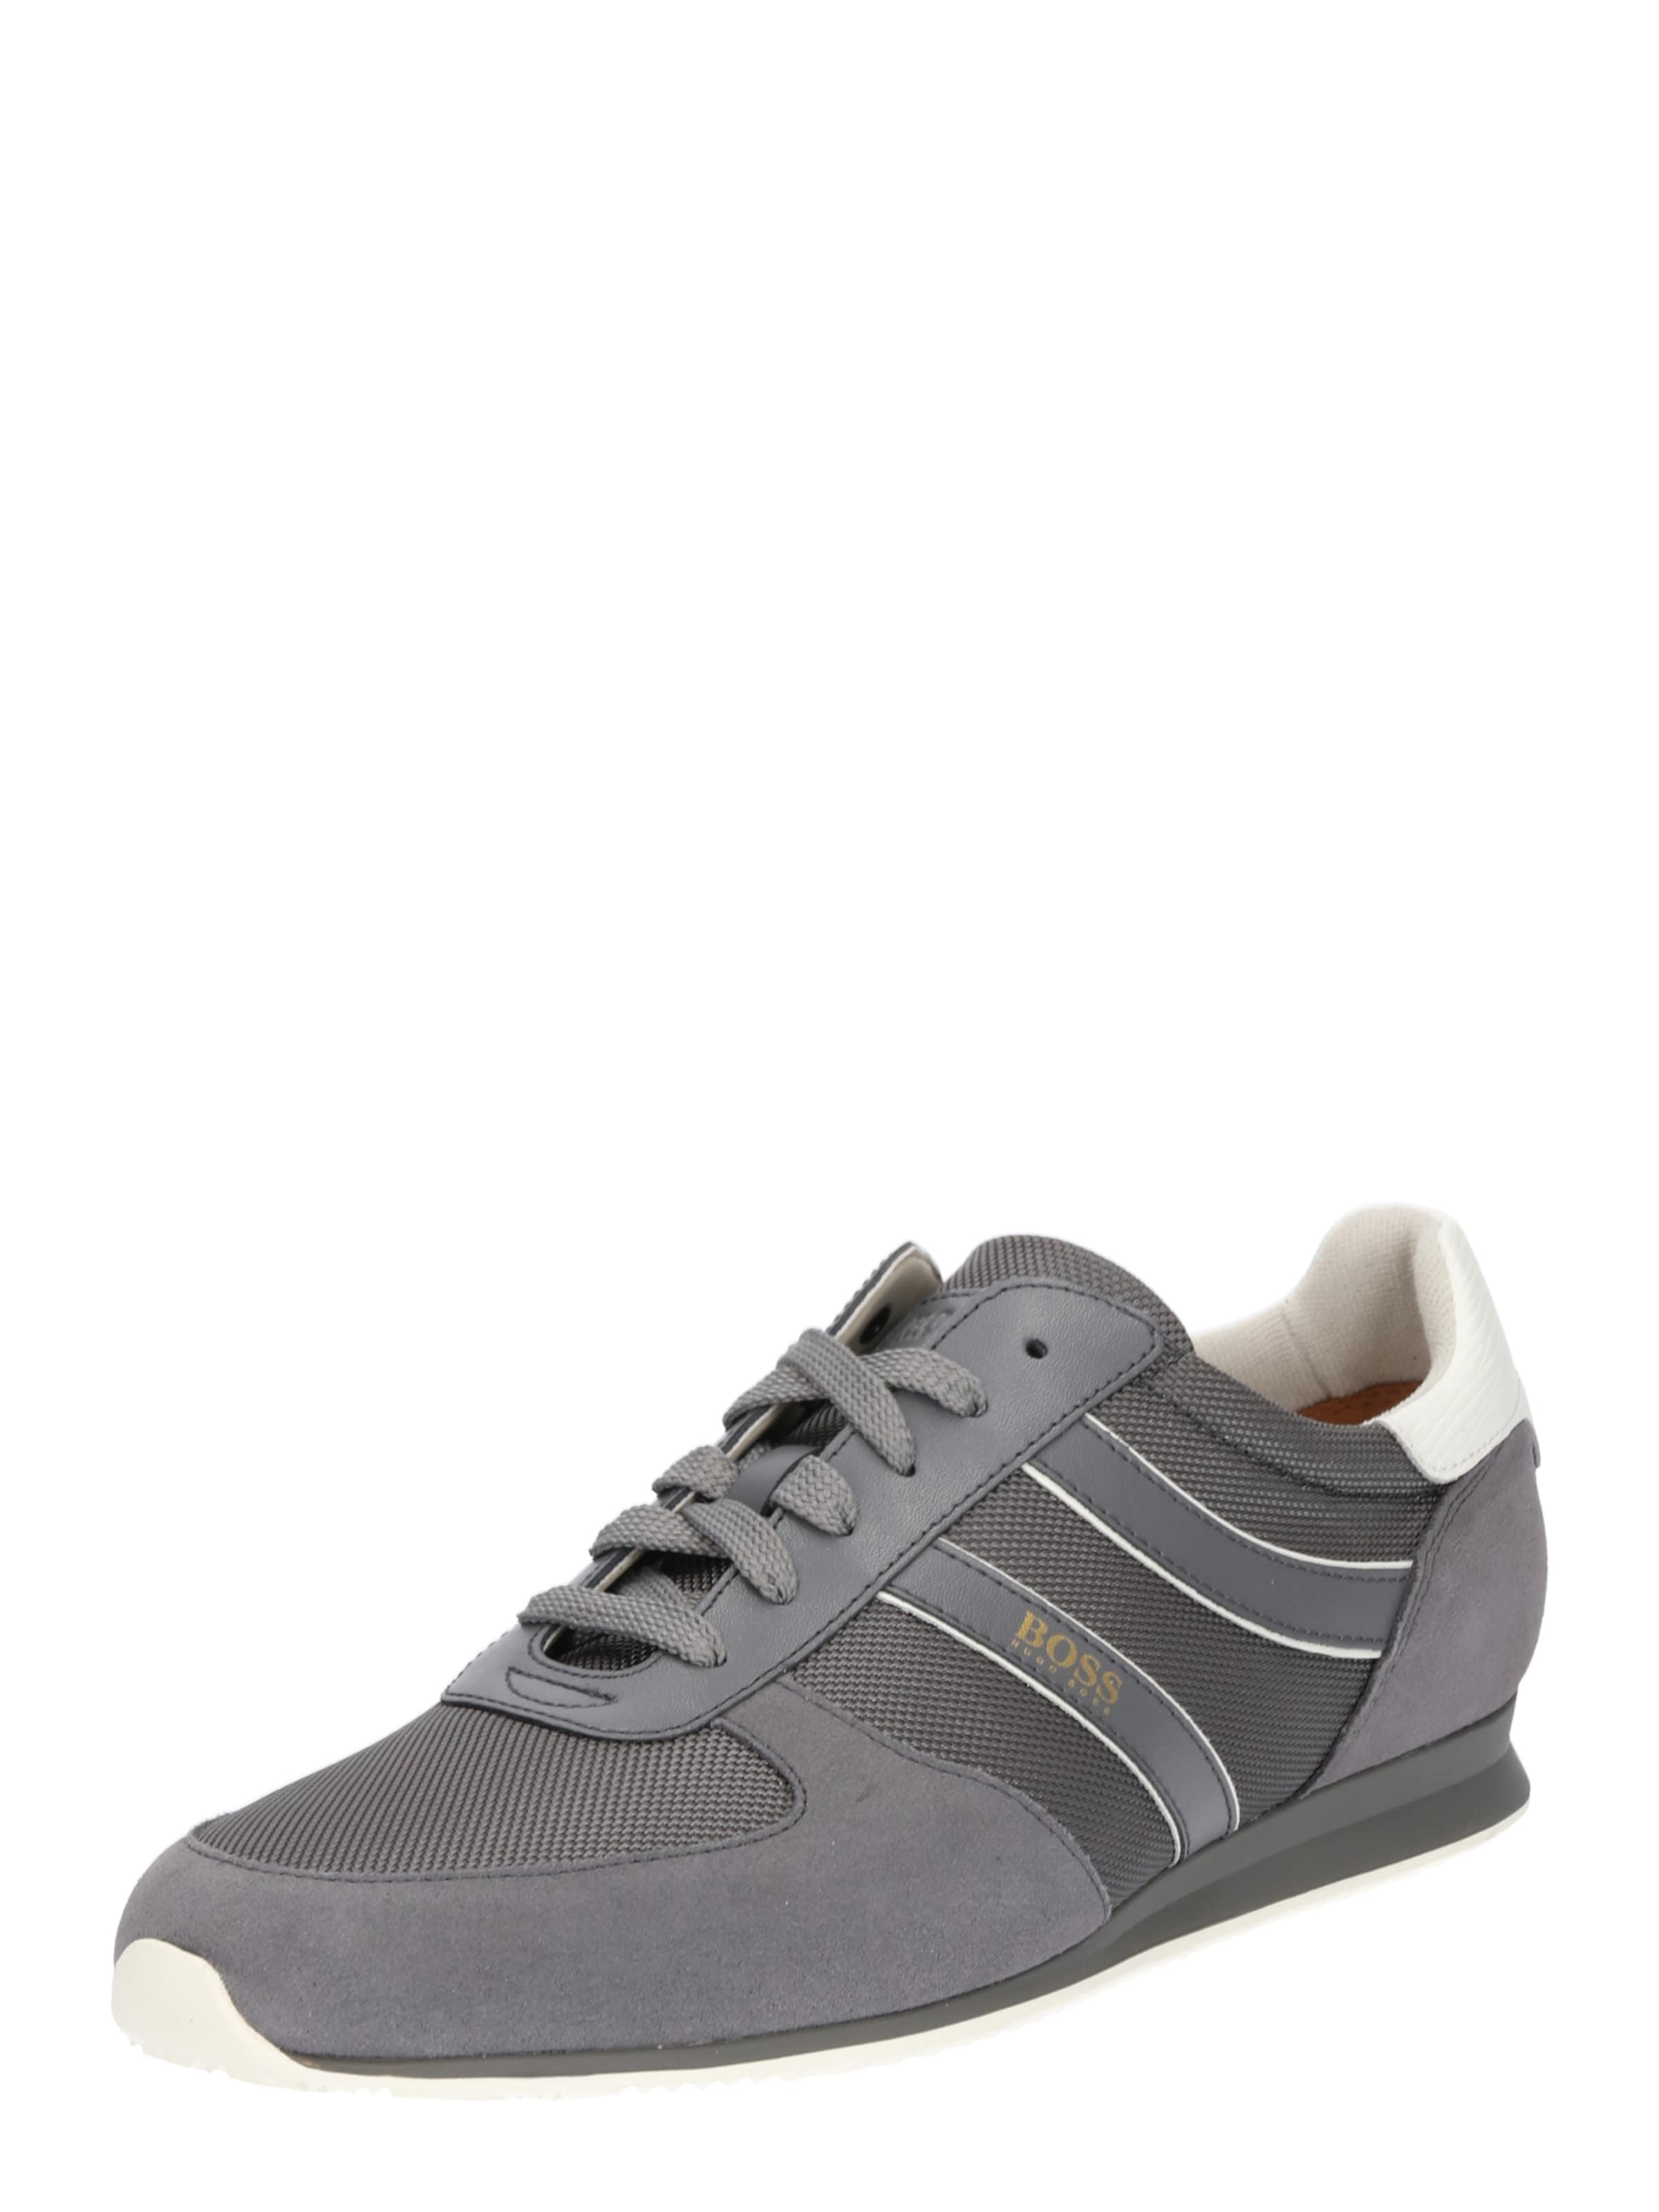 Haltbare Mode billige 'Orlando' Schuhe BOSS   Sneaker 'Orlando' billige Schuhe Gut getragene Schuhe c63f35